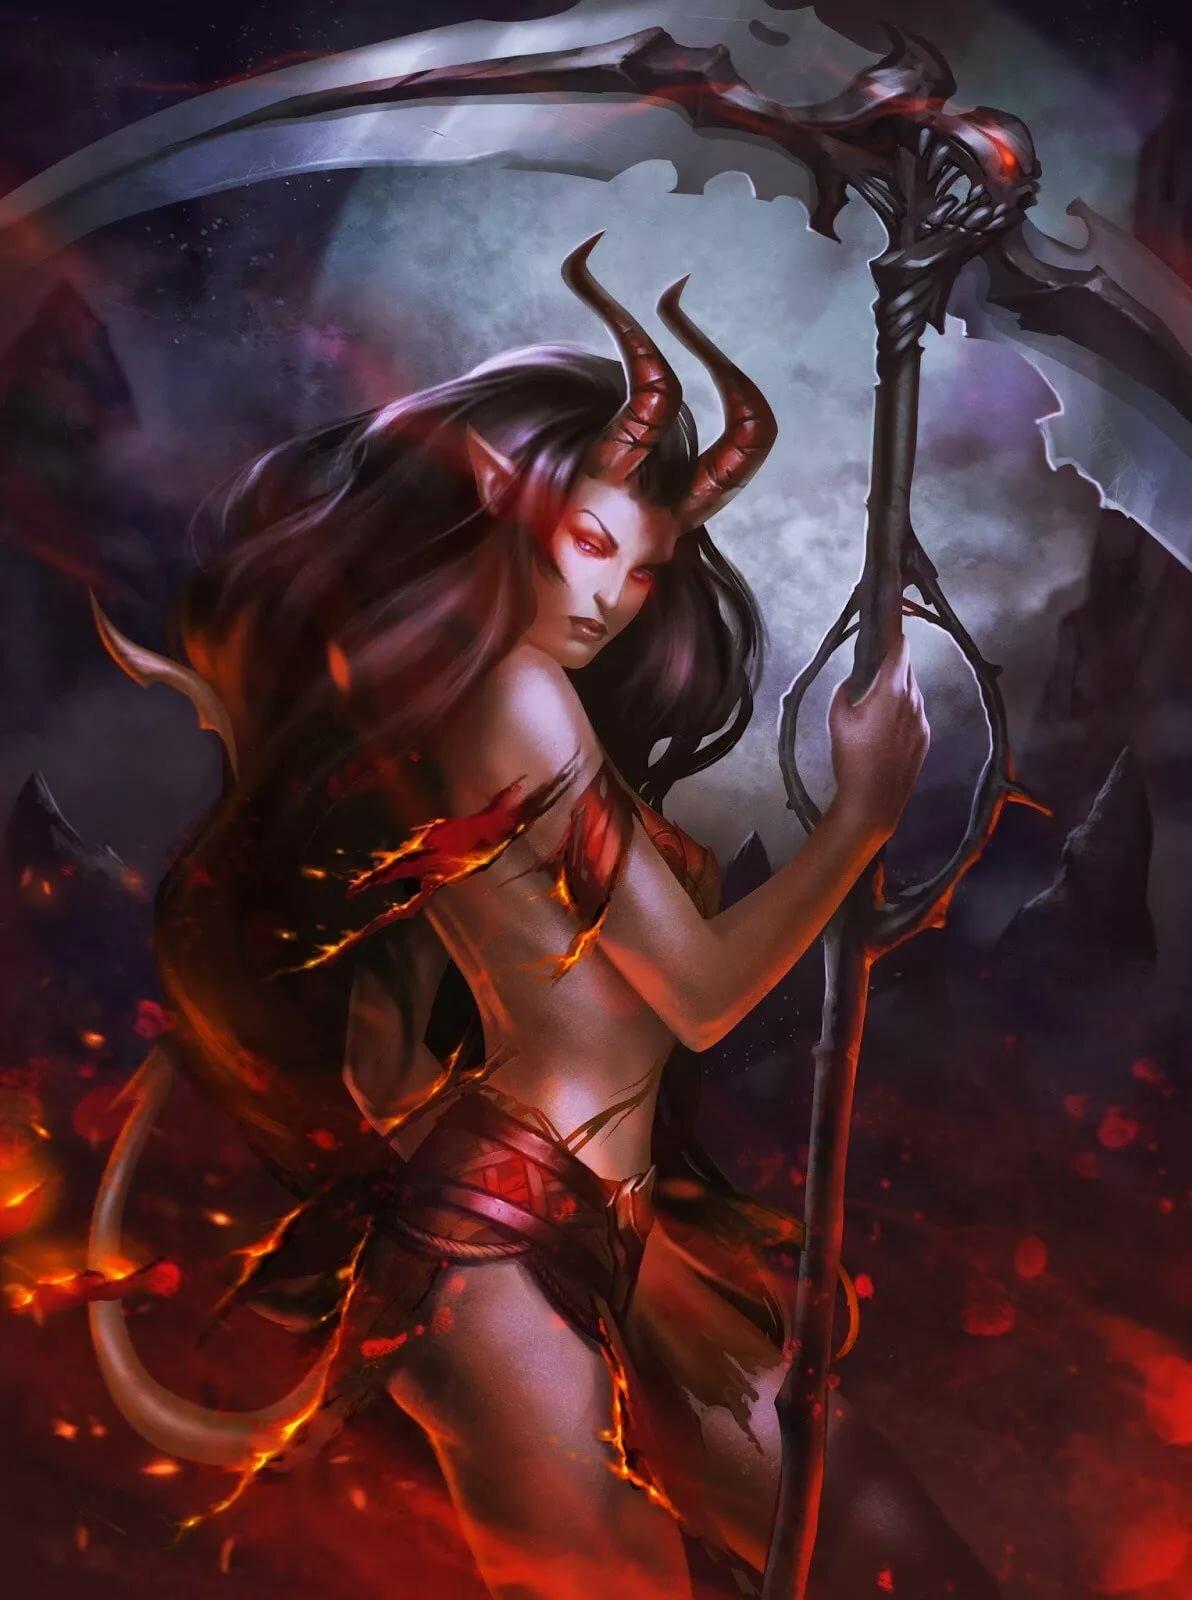 Картинки фэнтези девушки и демоны